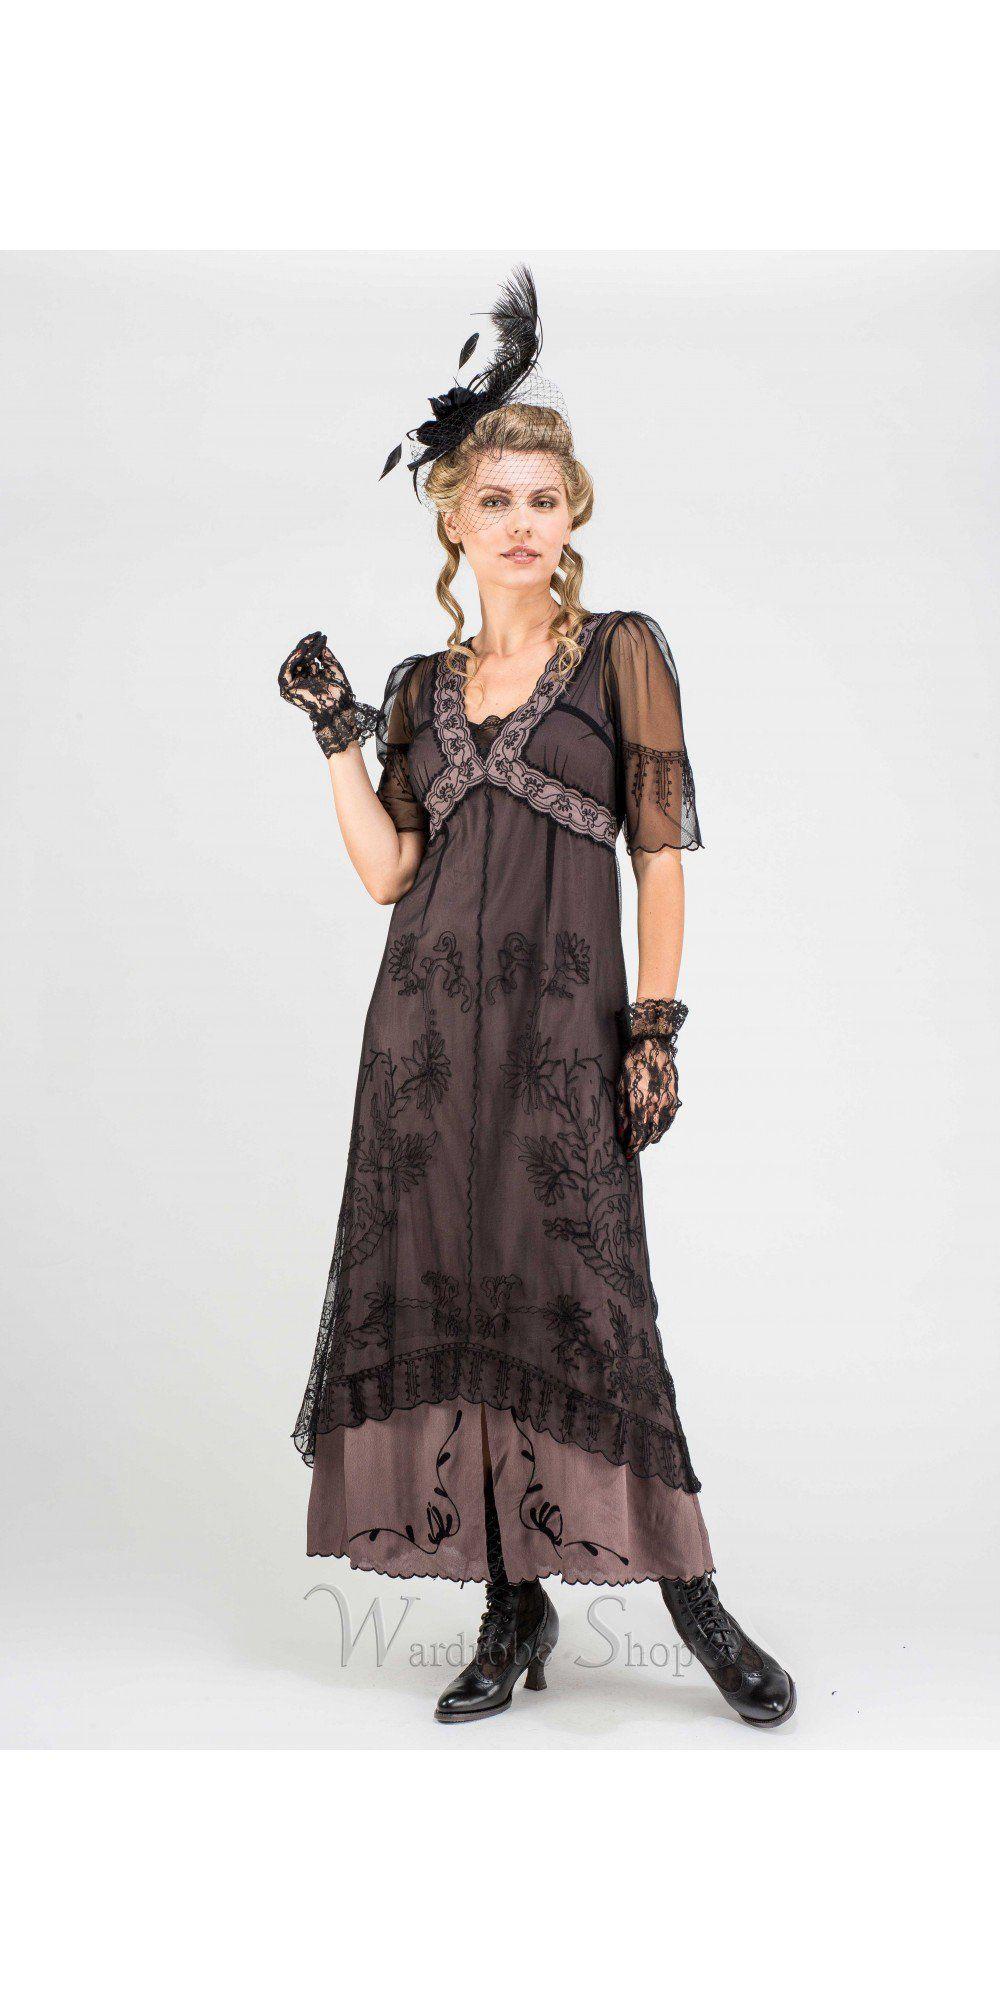 New Vintage Titanic Tea Party Dress In Black Coco By Nataya Tea Party Dress Romantic Dress Titanic Dress [ 2000 x 1000 Pixel ]